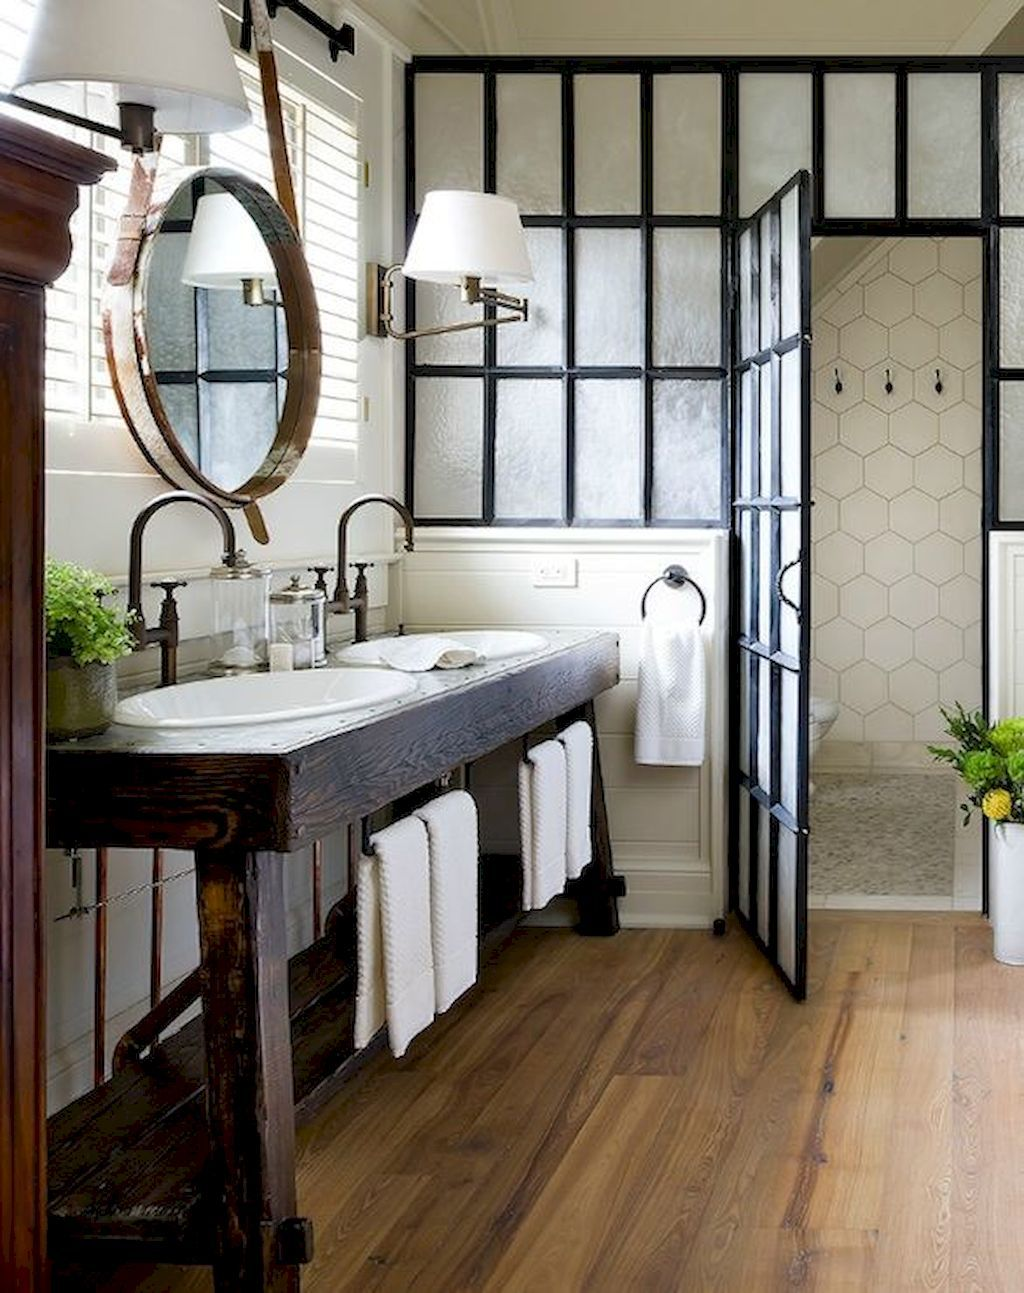 Adorable 85 Modern Farmhouse Bathroom Design Ideas